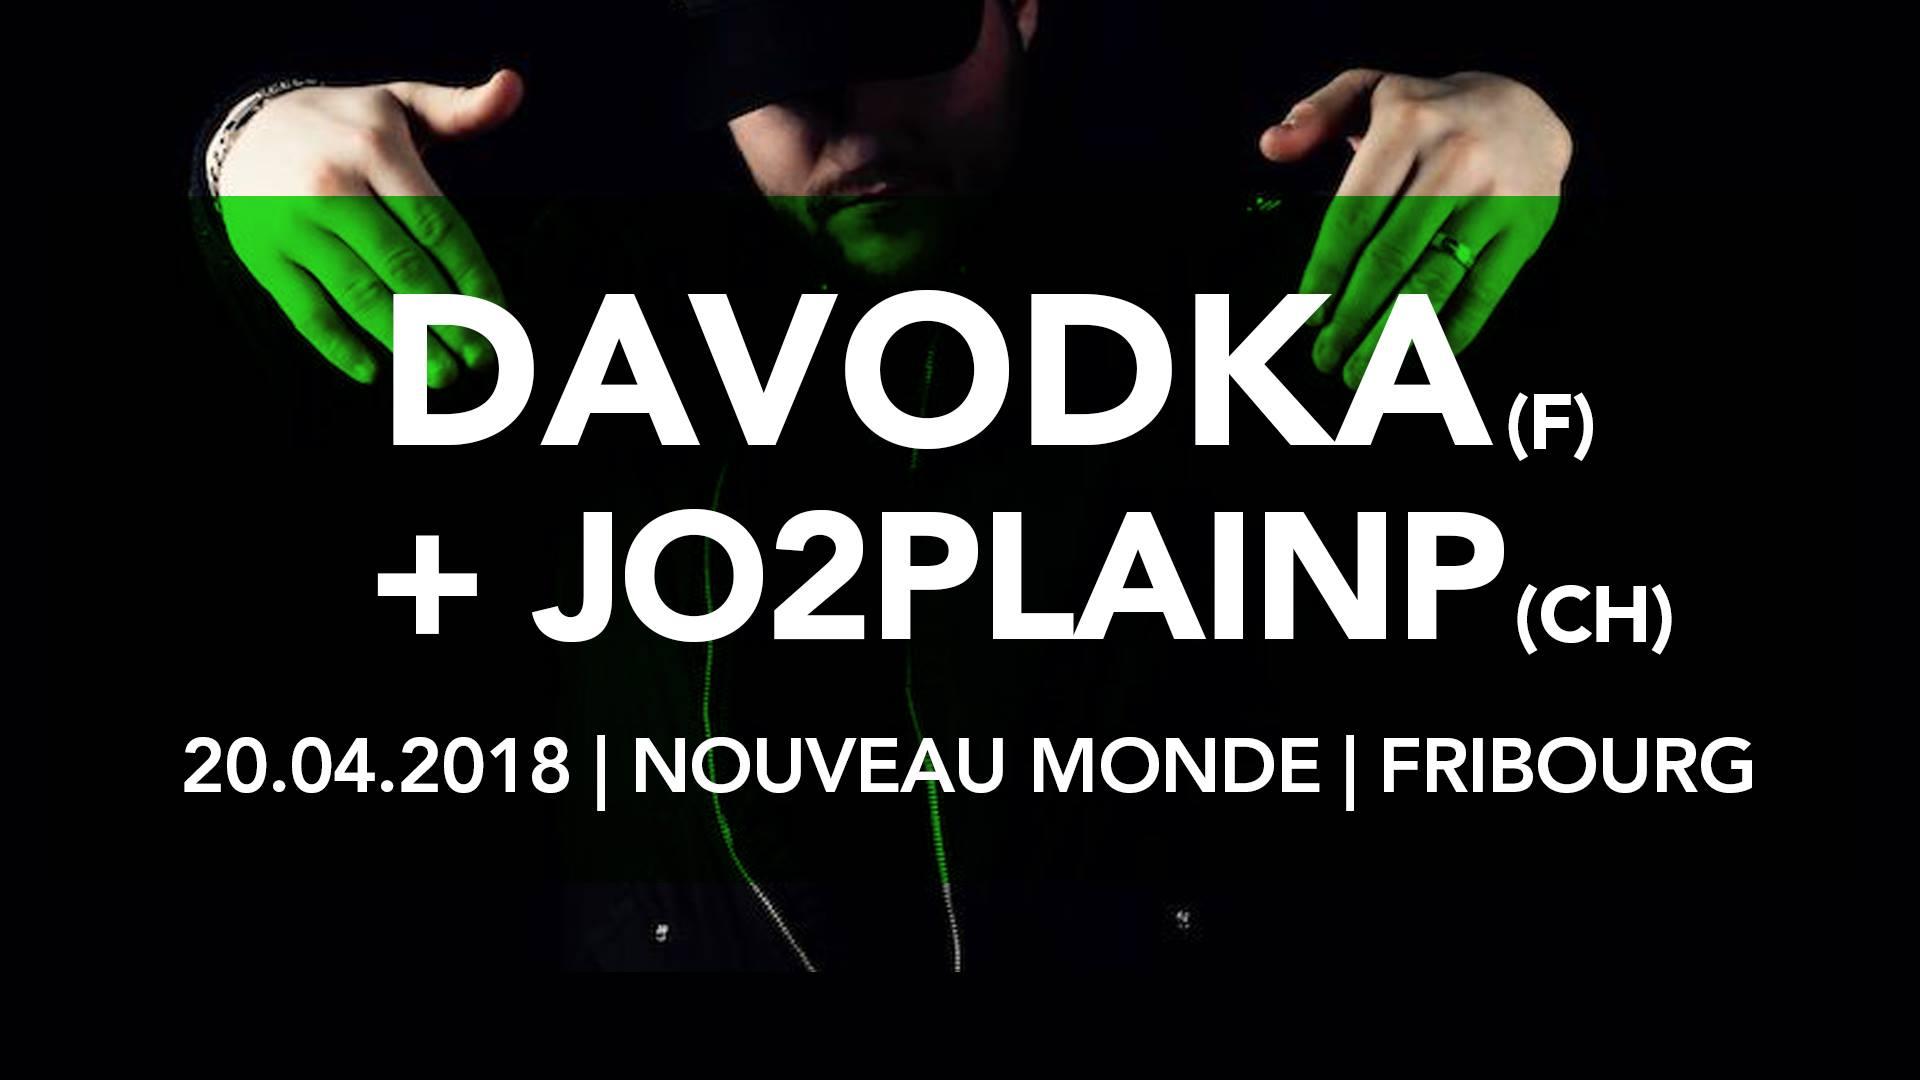 Davodka @ Nouveau monde